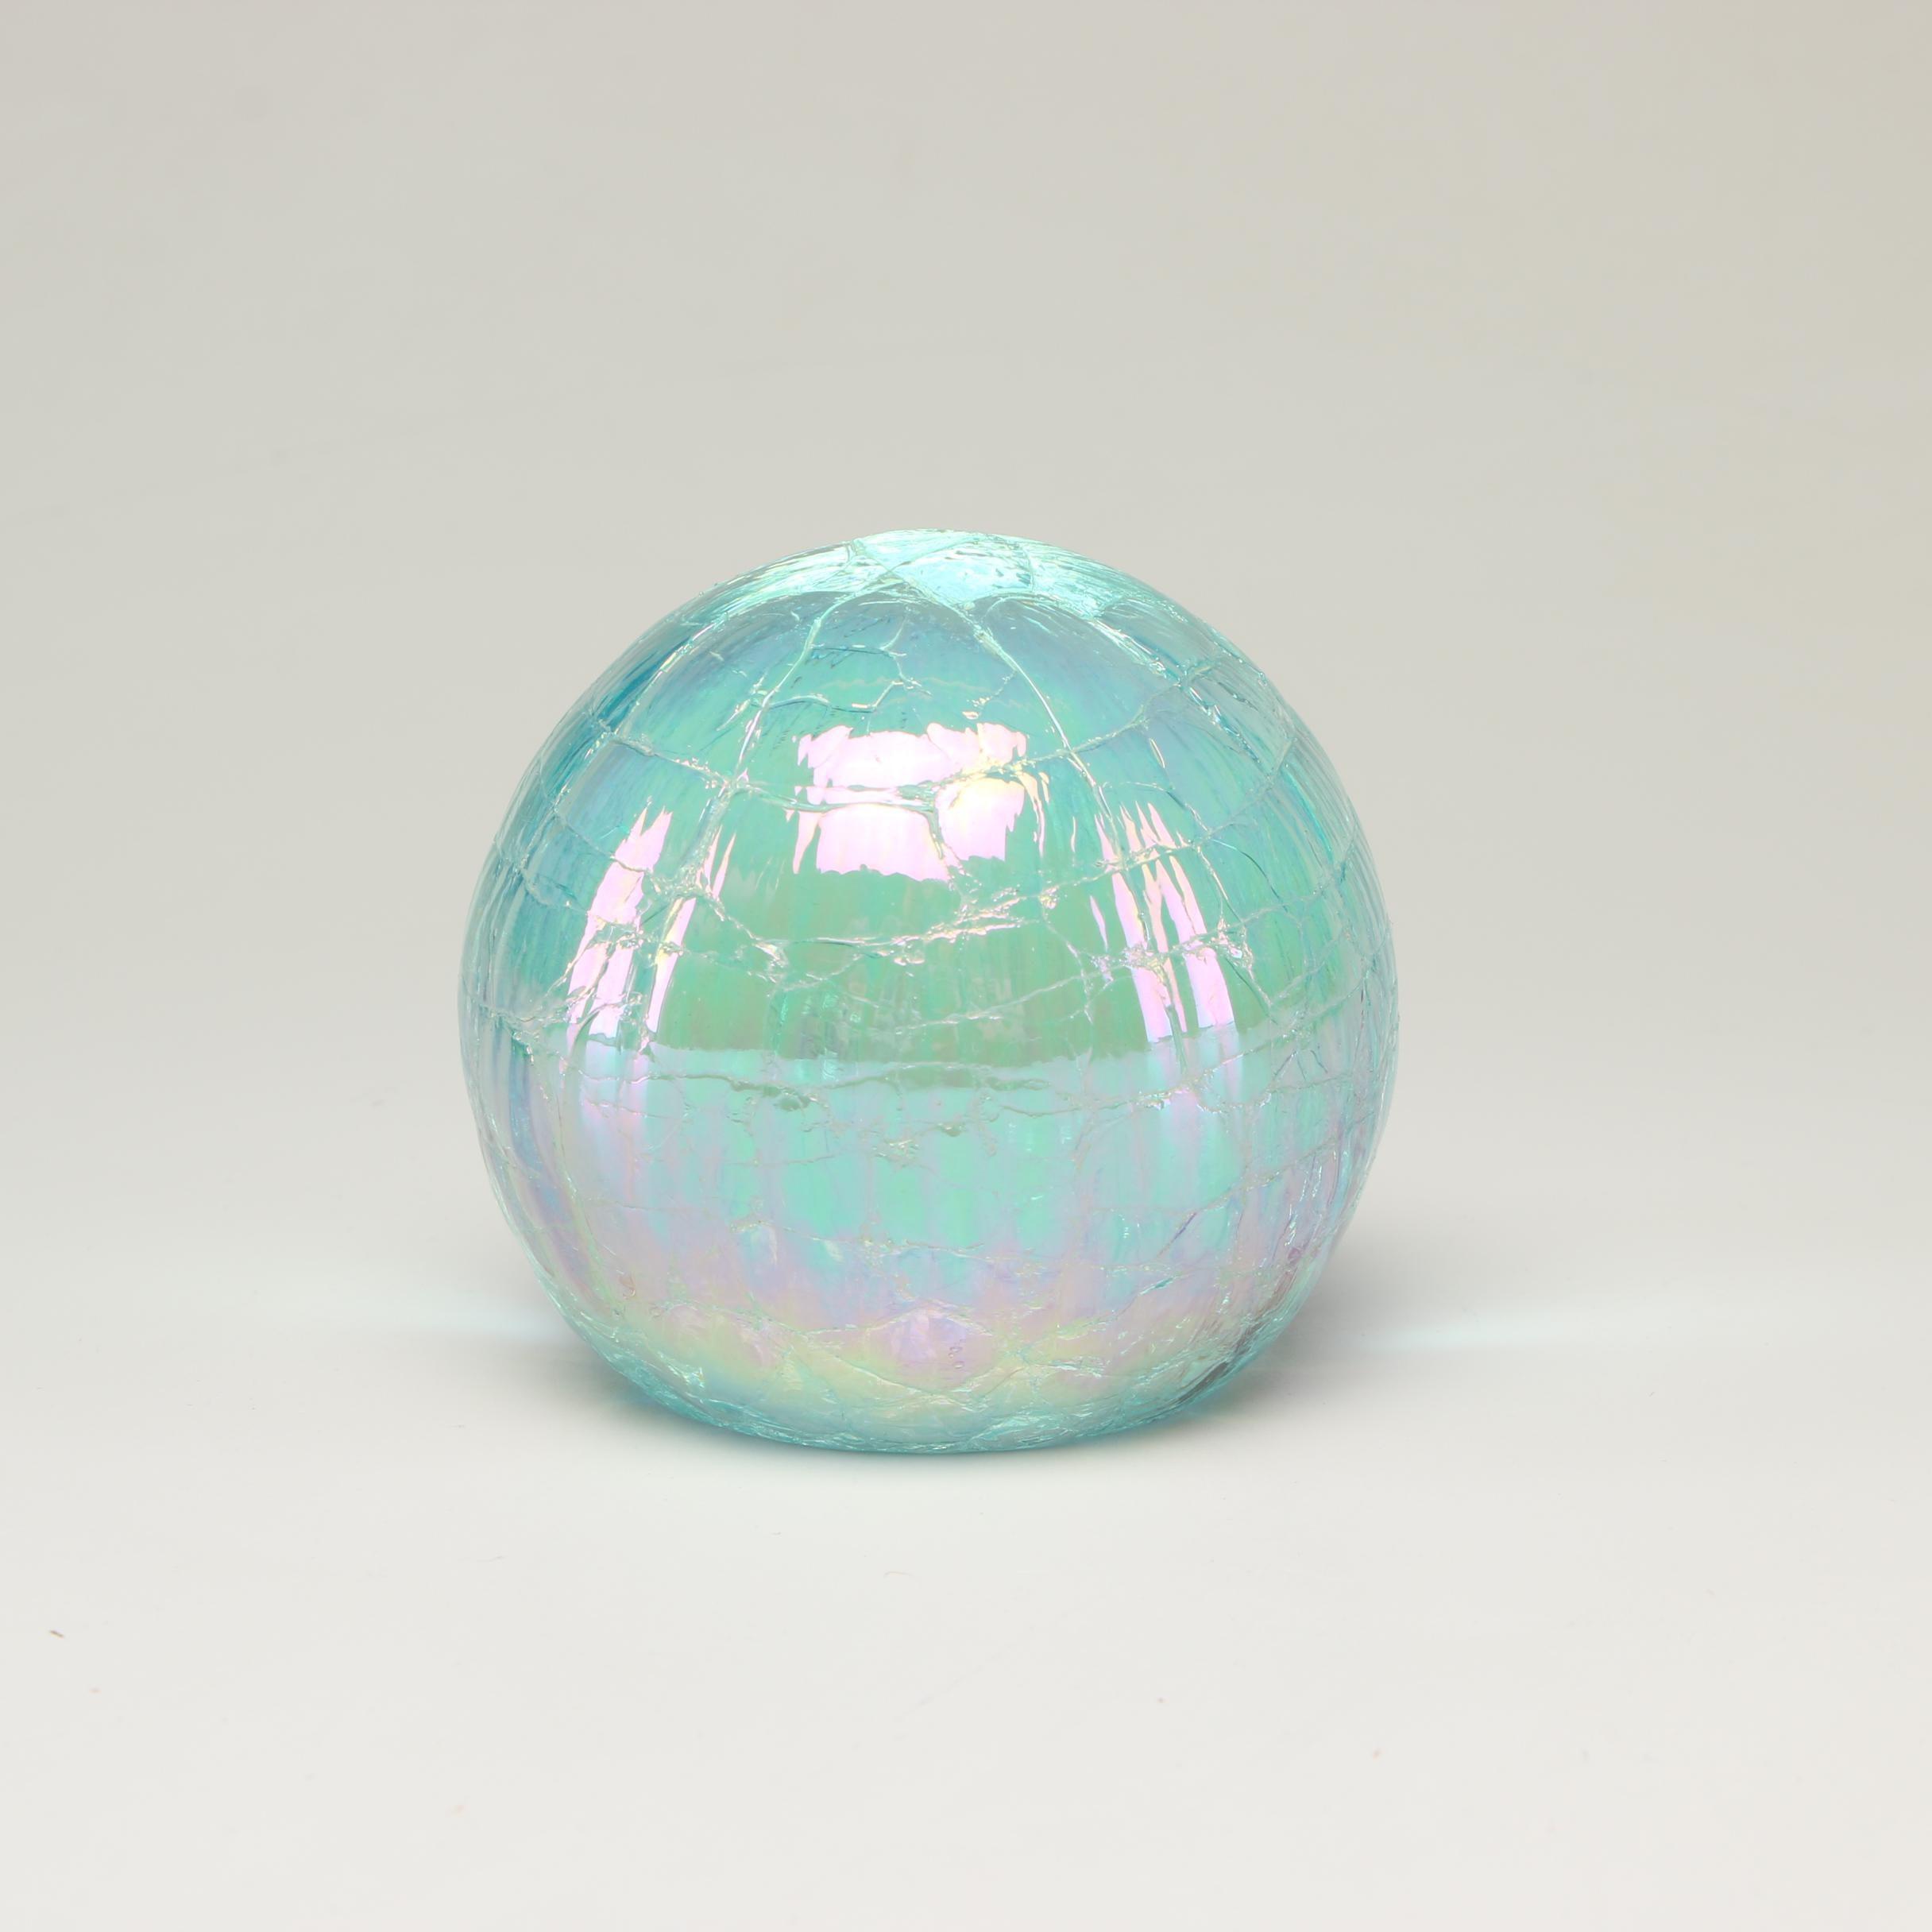 Ornamental Blown Glass Company Iridescent Paperweight